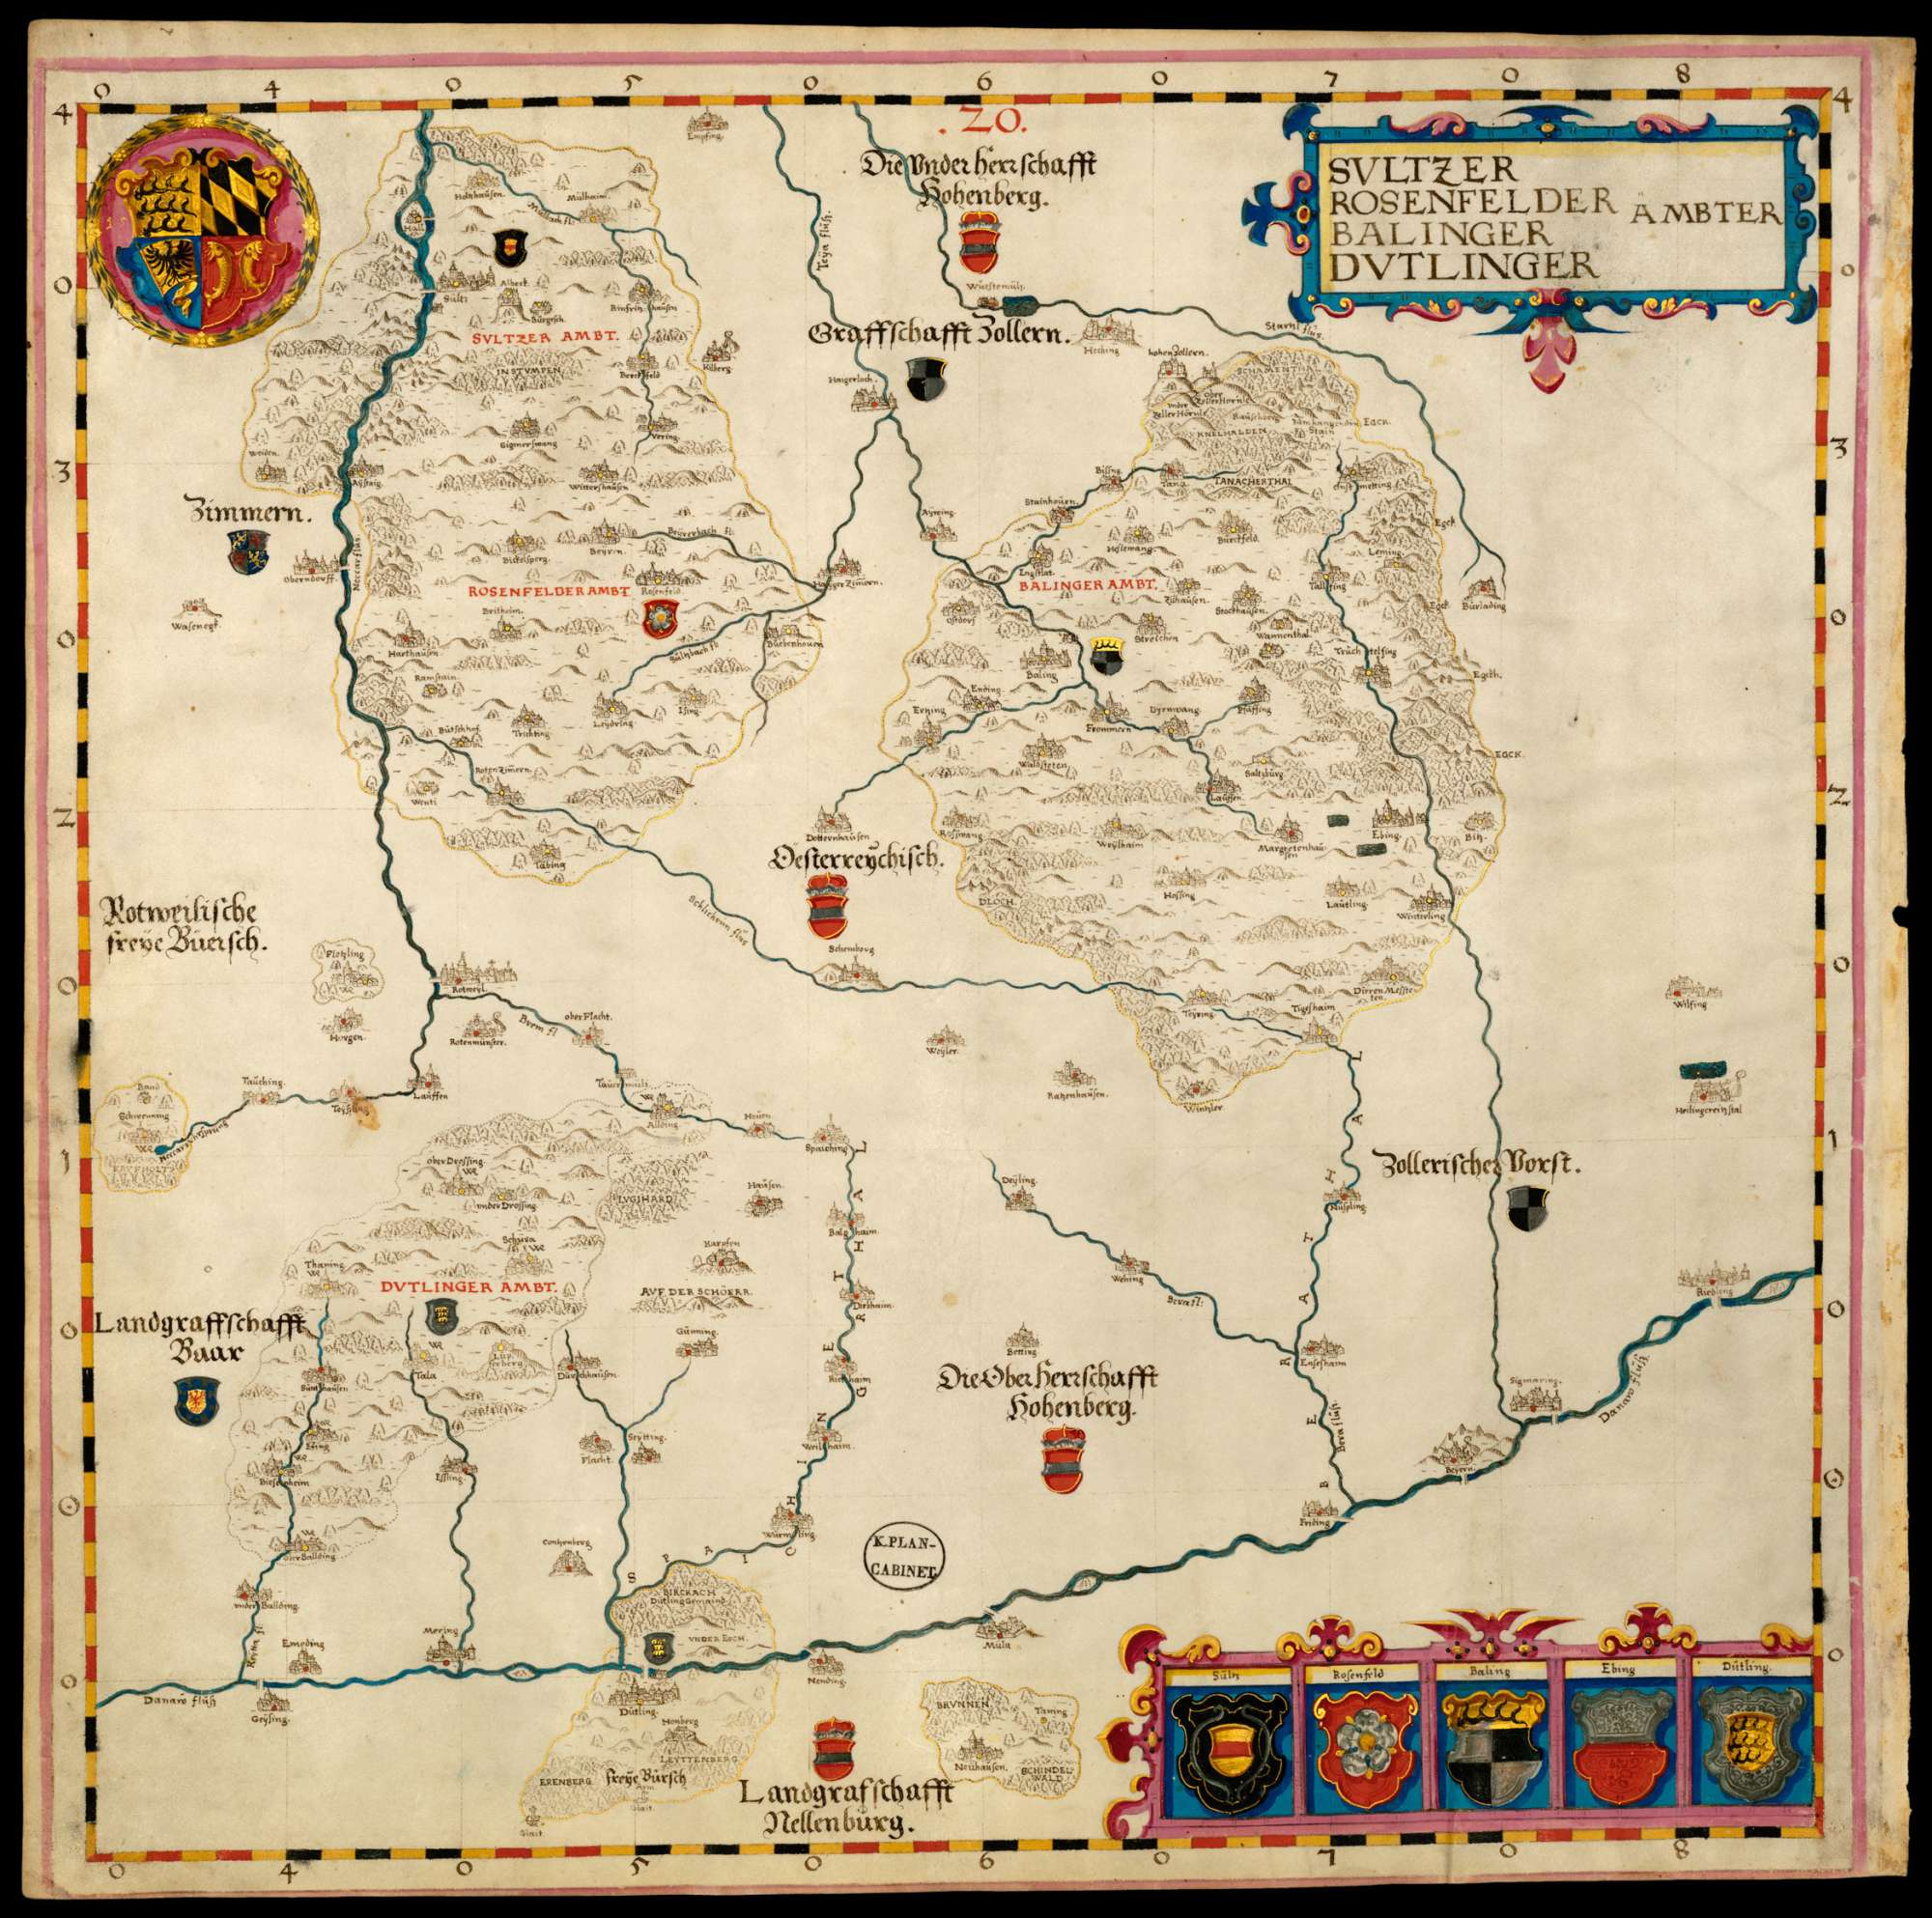 Bl. 24 v: Ämter Sulz, Rosenfeld, Balingen und Tuttlingen (20), Bild 1